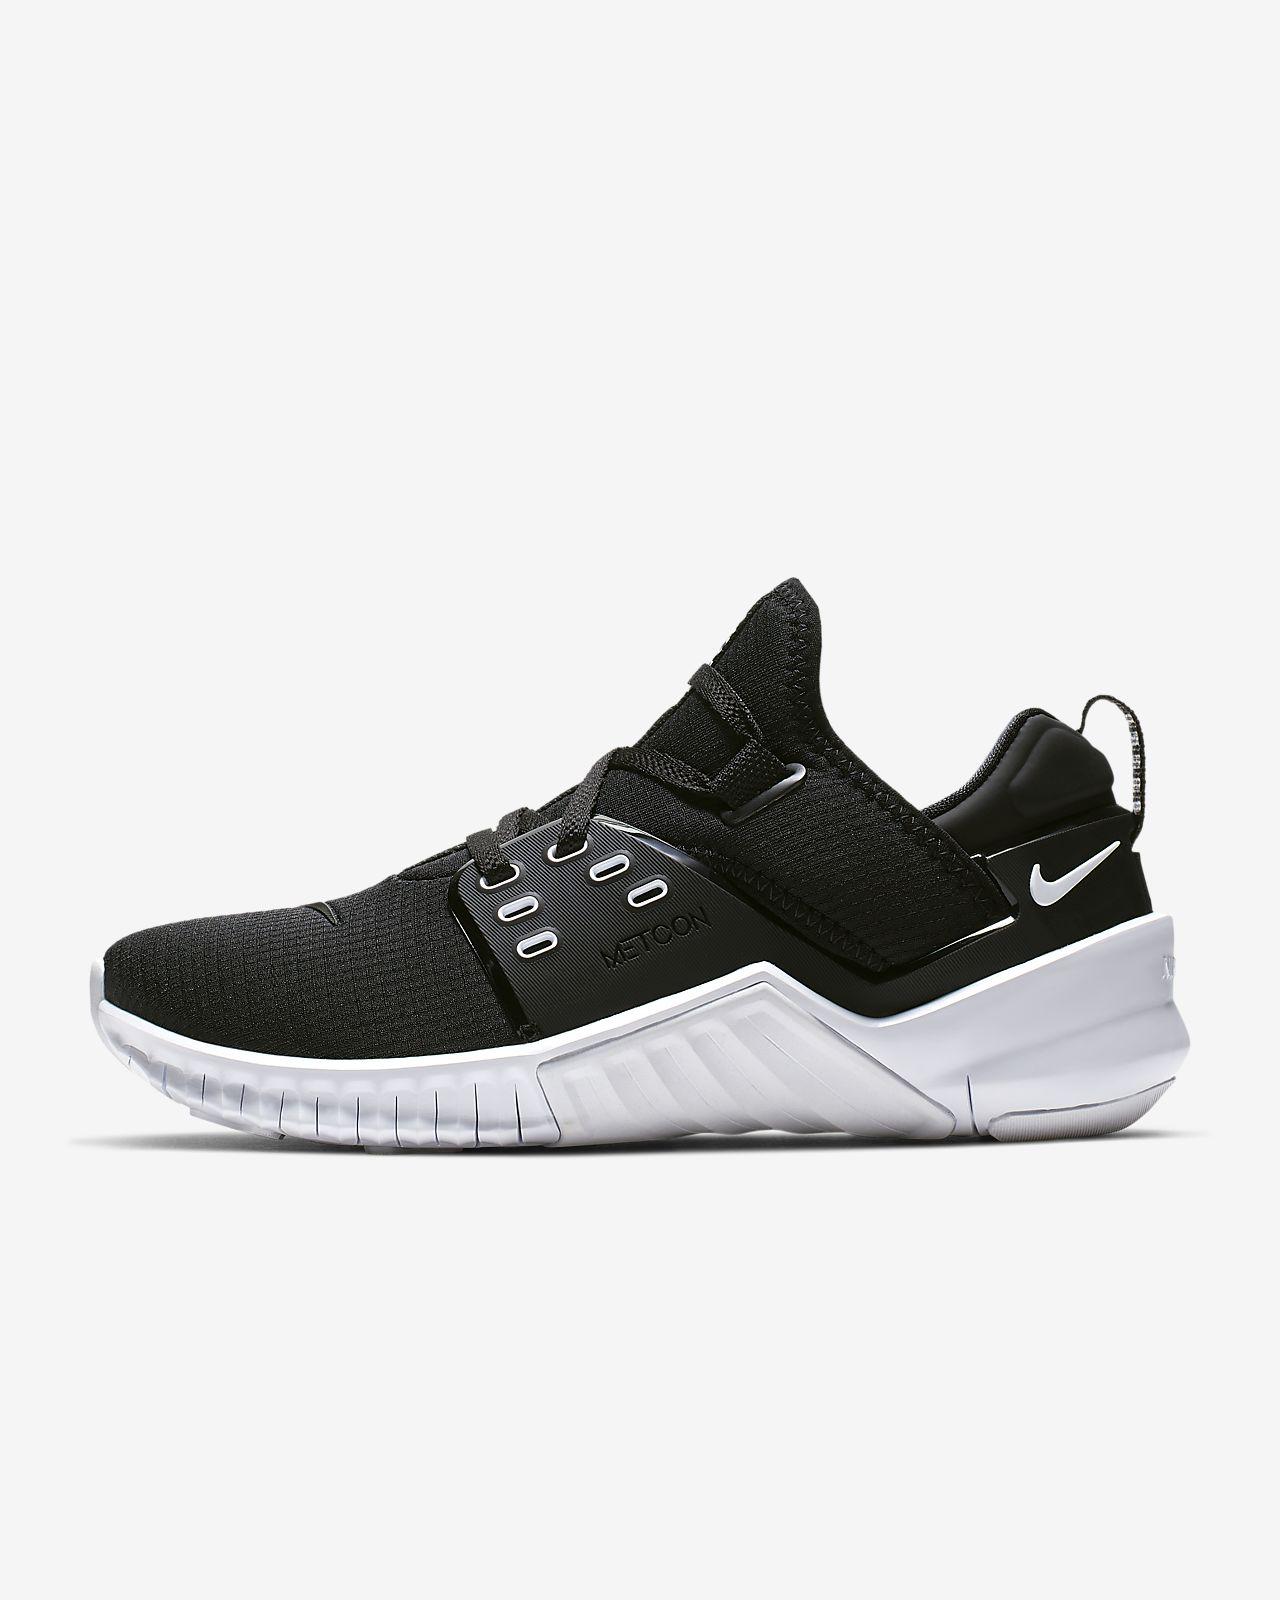 Wmns Free 5.0+   Nike, Sneakers nike, Shoes